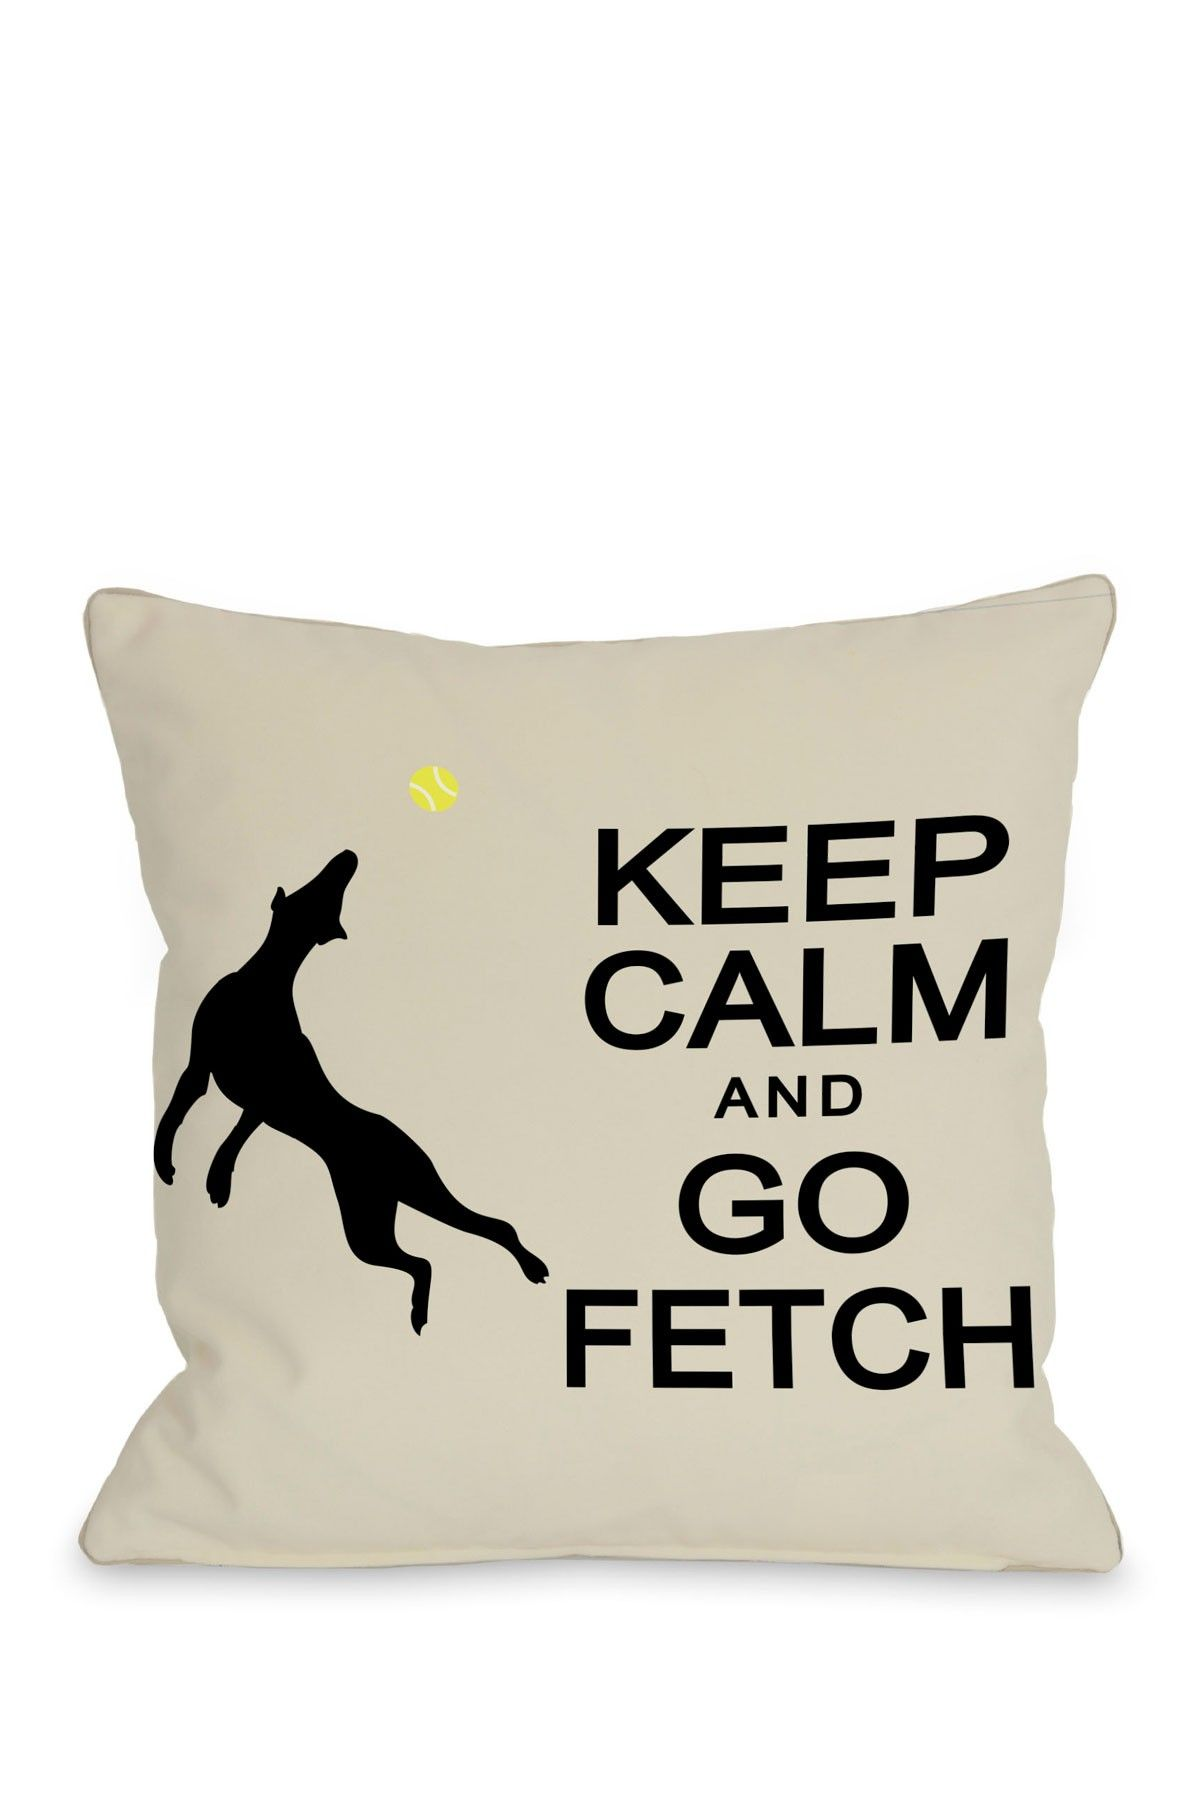 Keep Calm & Go Fetch Pillow Throw pillows, Pillows